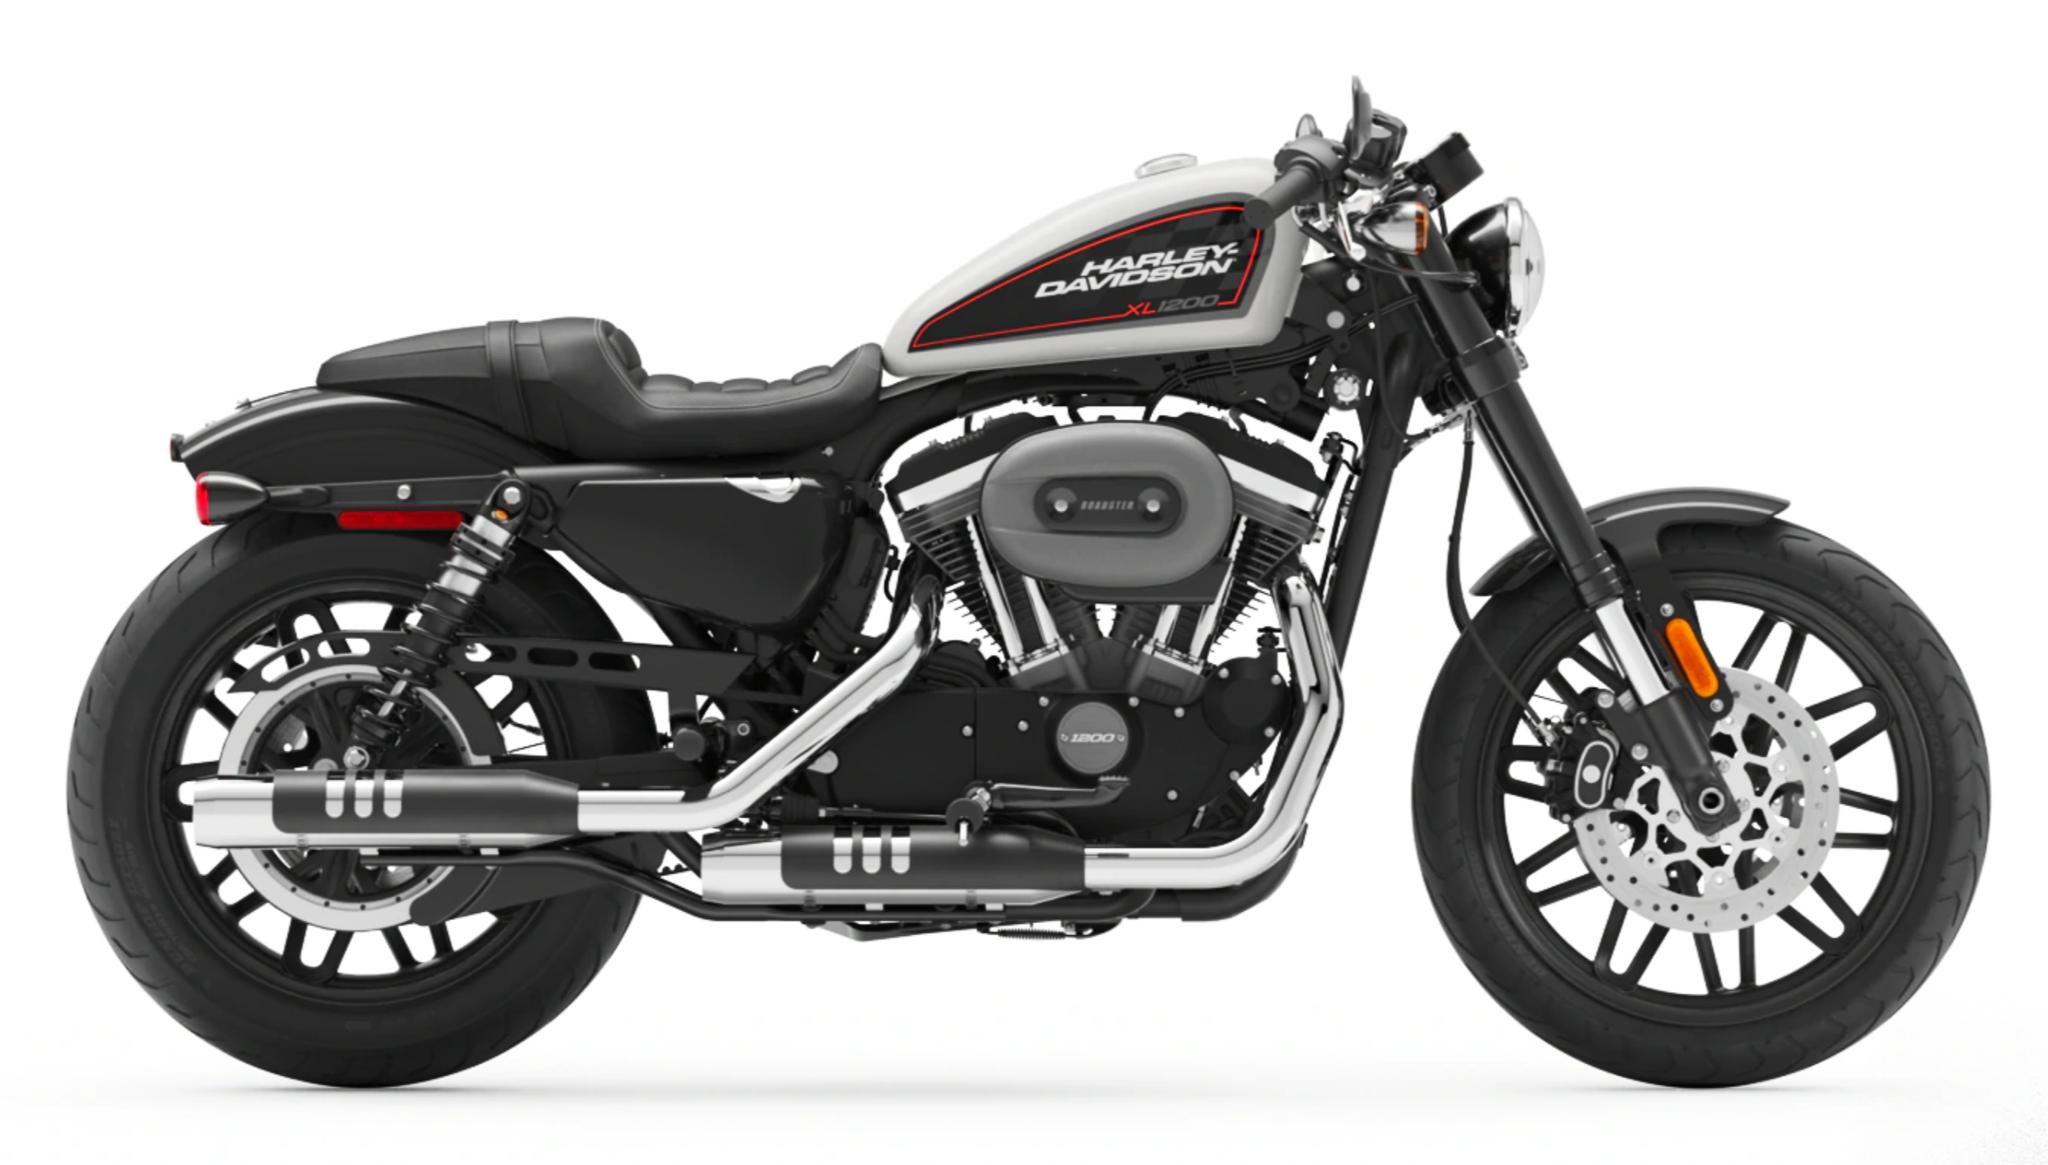 Harley 1200 Roadster